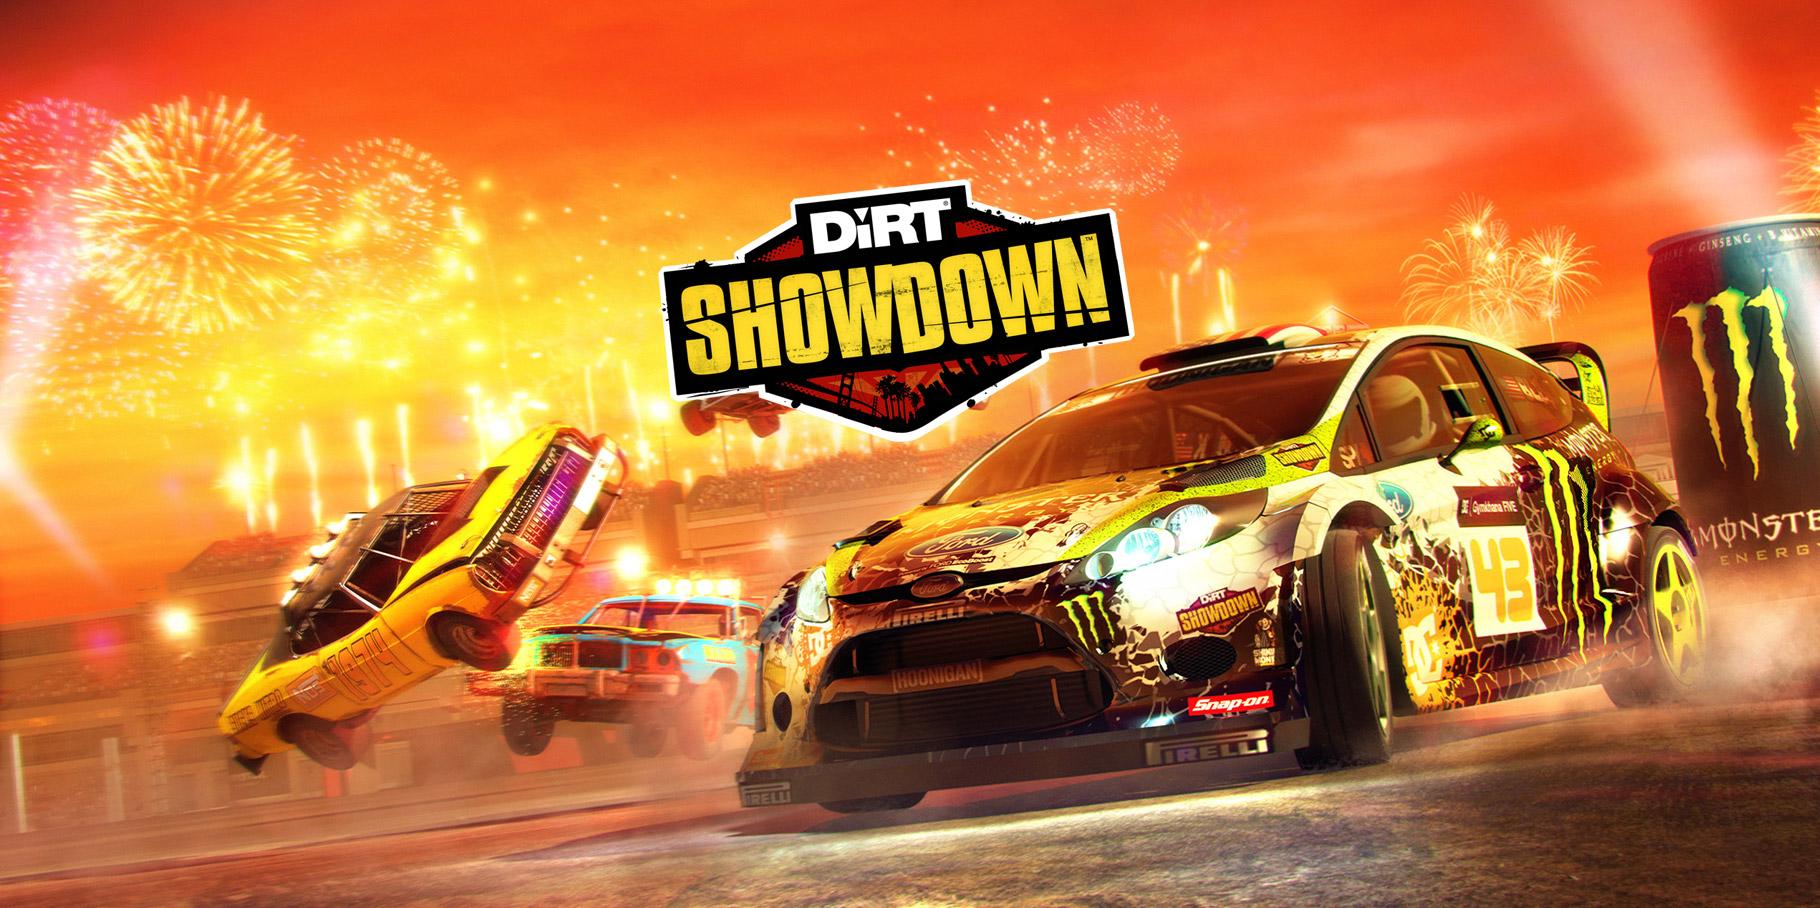 DiRT Showdown Free Download